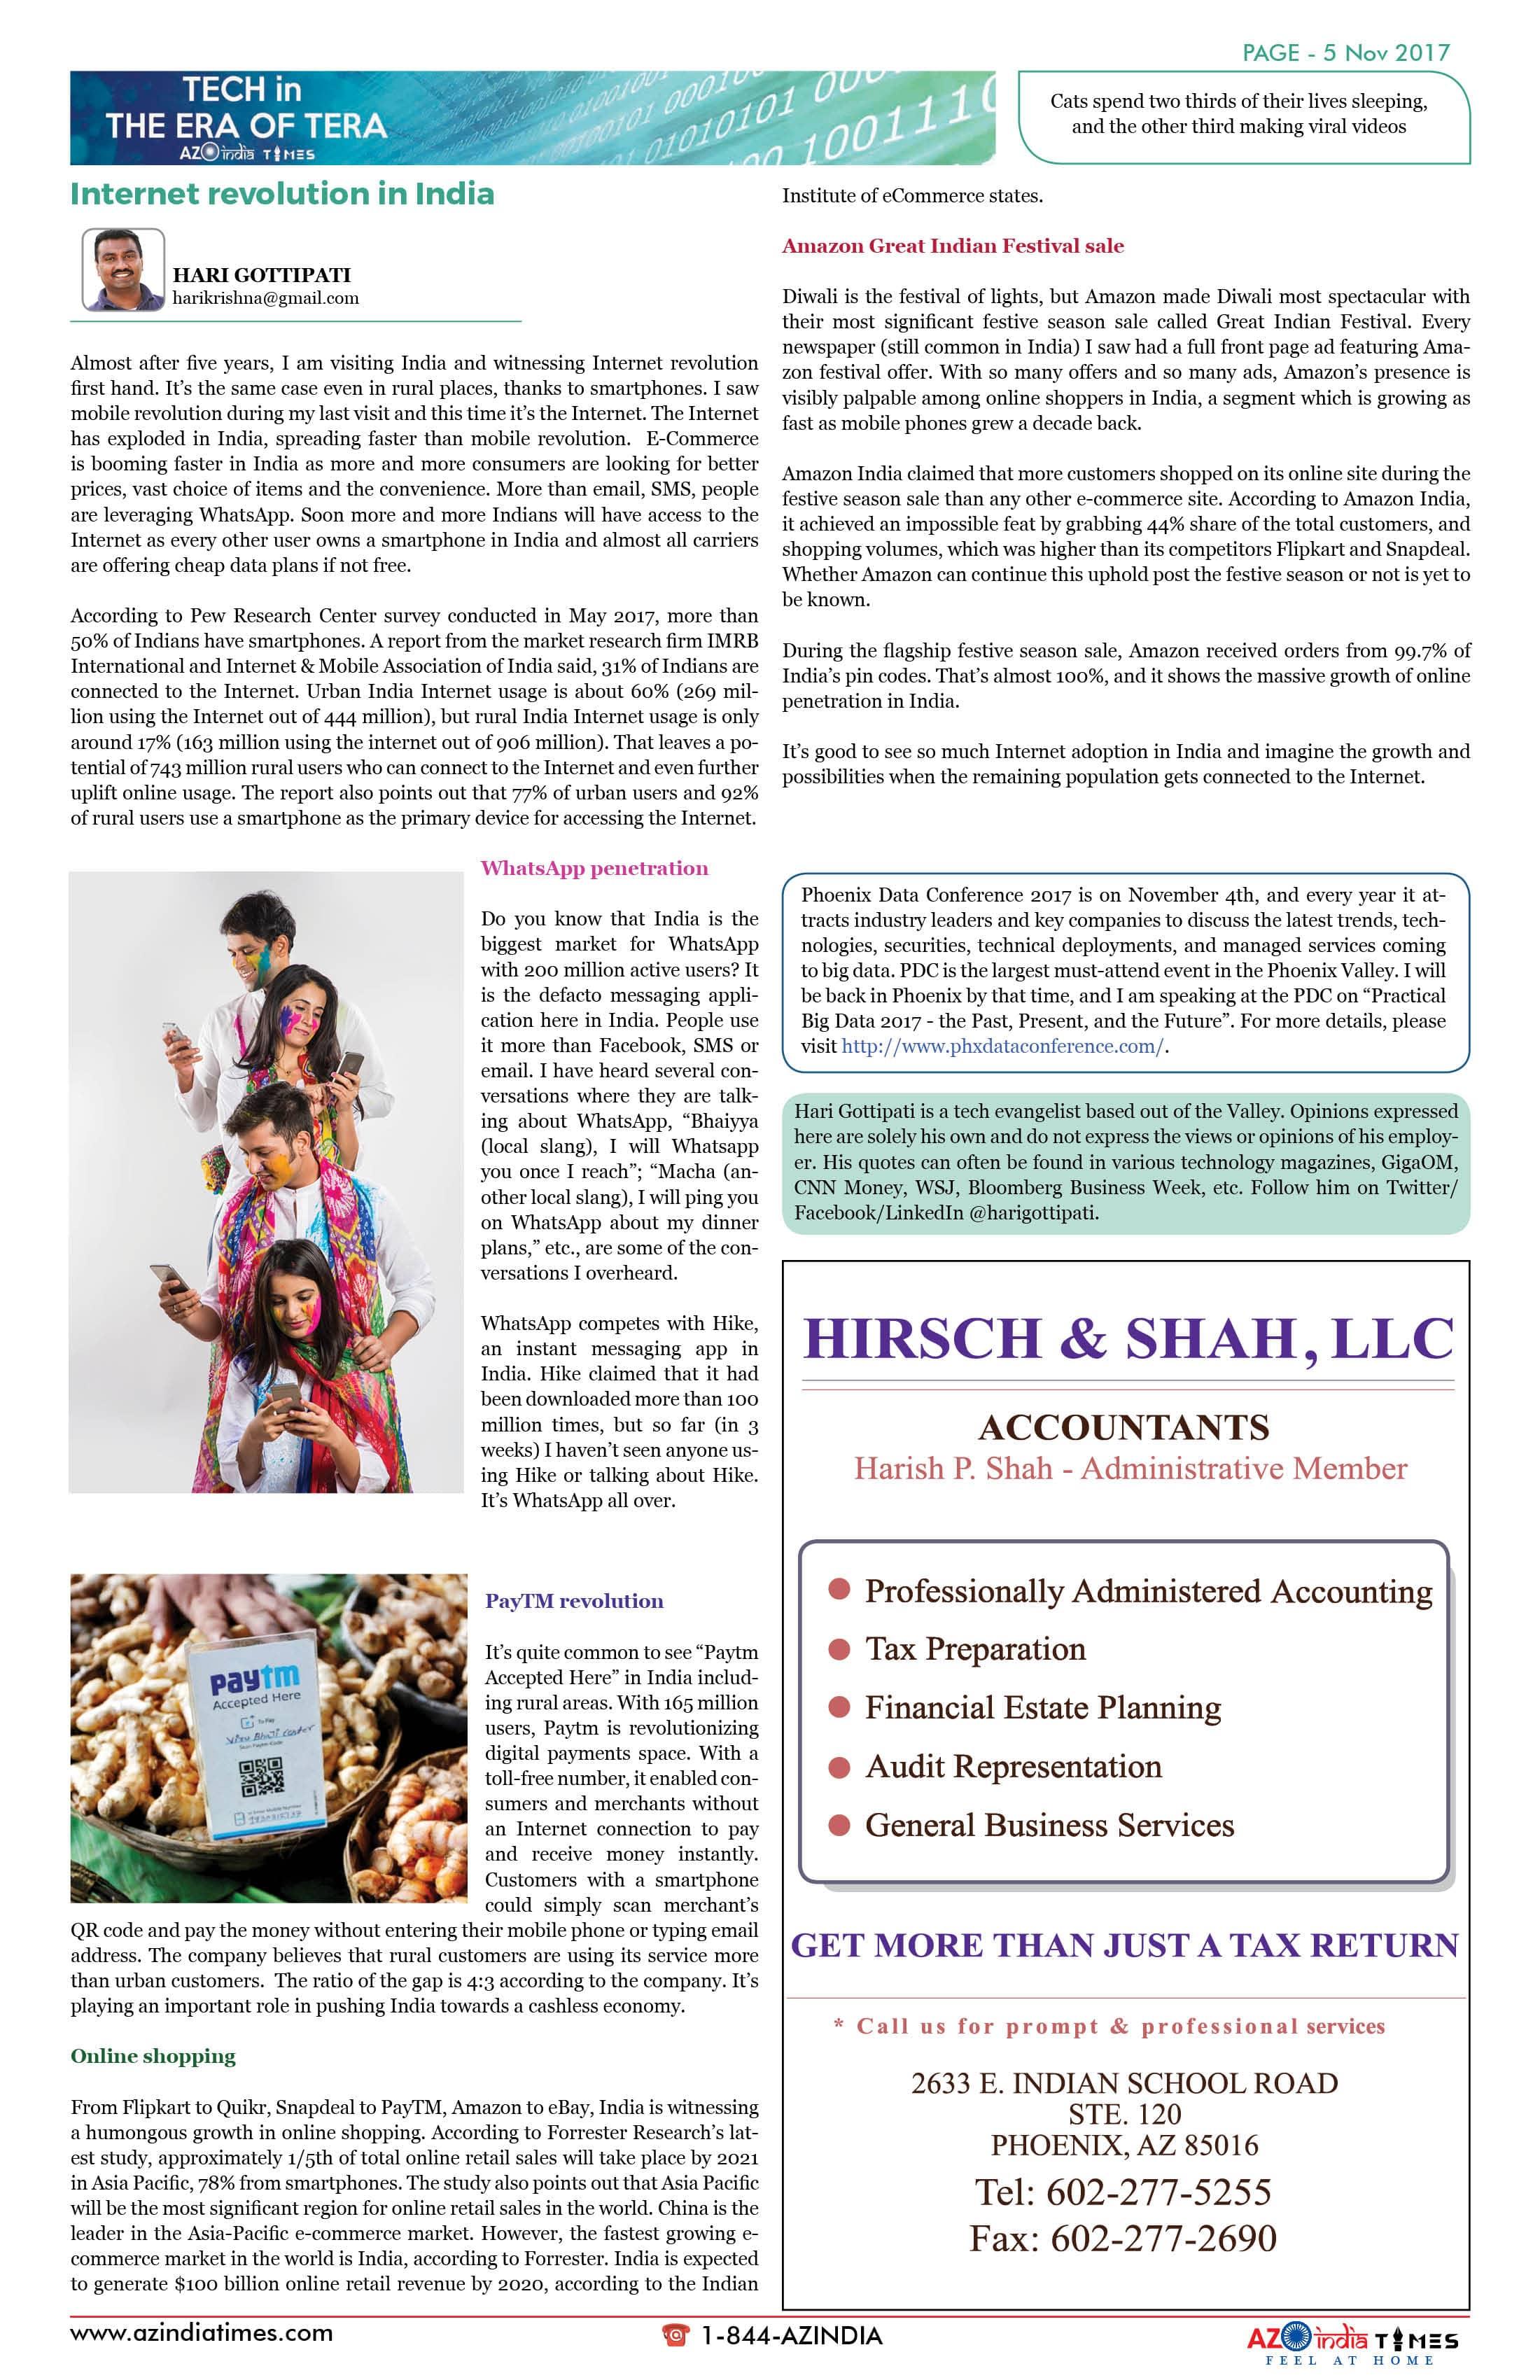 AZ INDIA TIMES NOVEMBER EDITION5